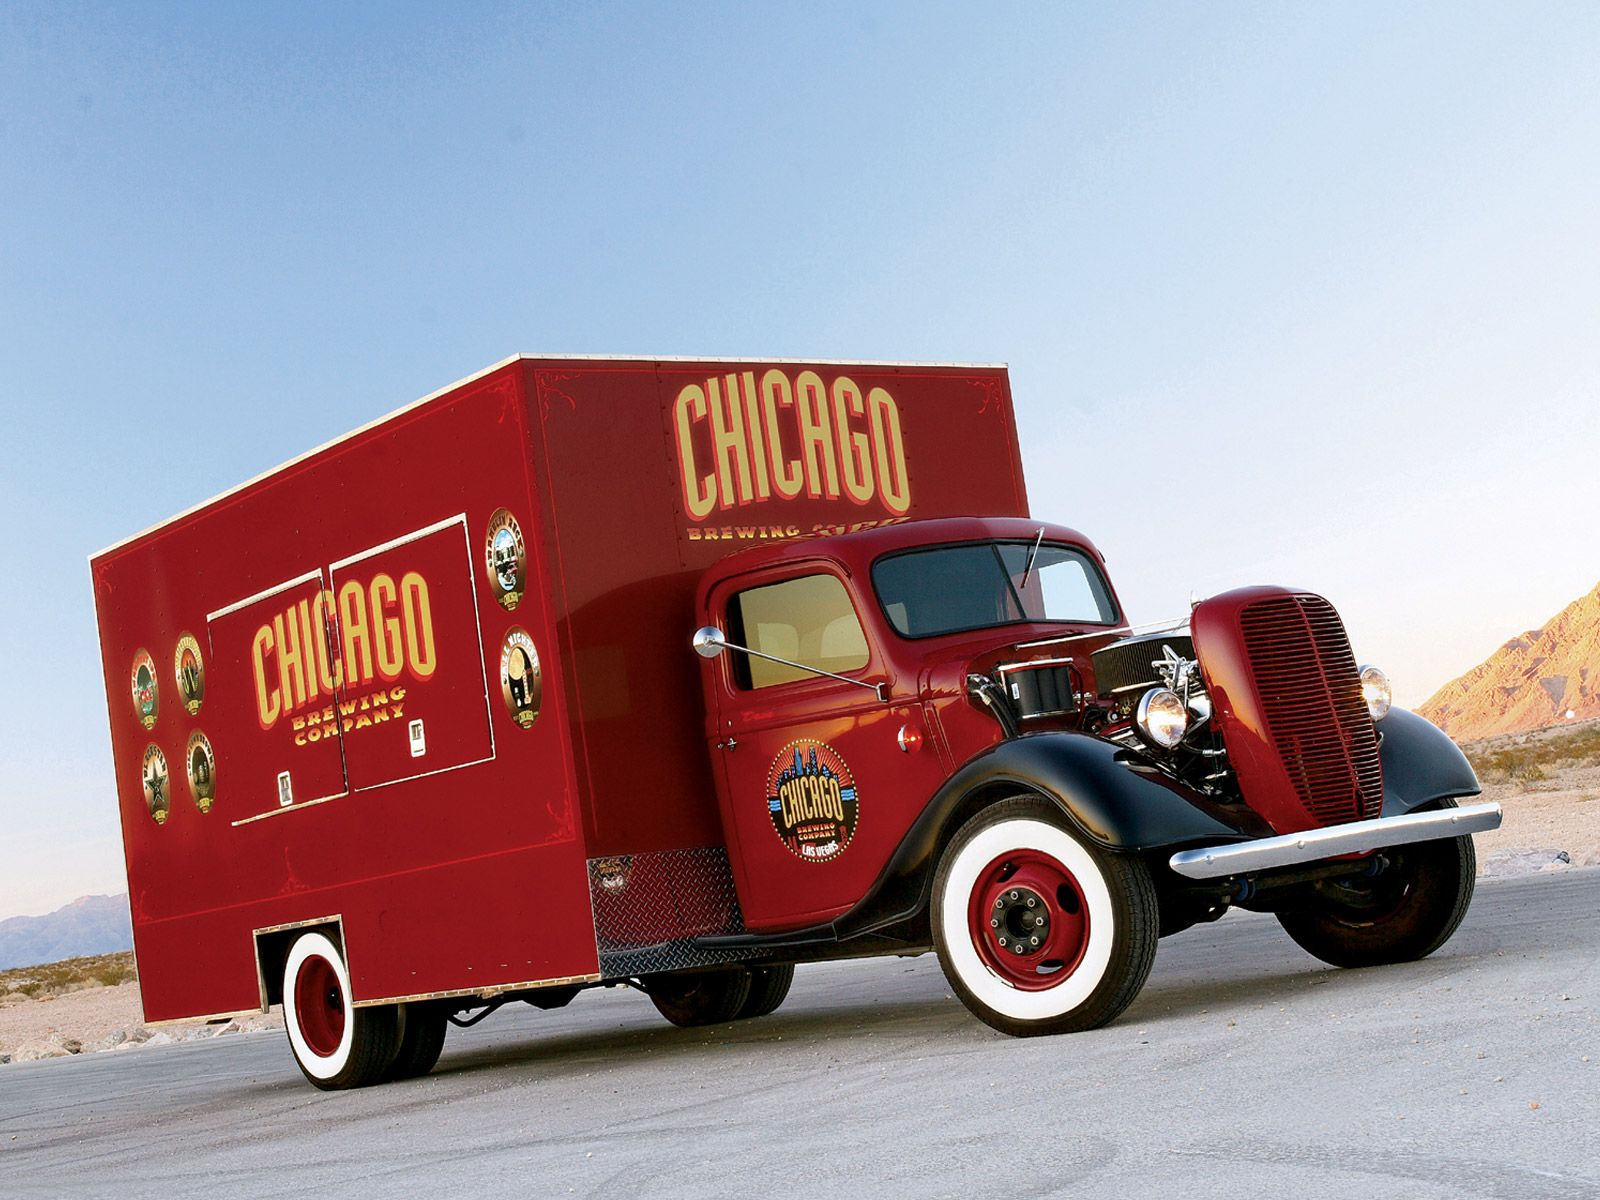 Galleria Furniture Box Truck Truck Graphics Trucks Furniture Box